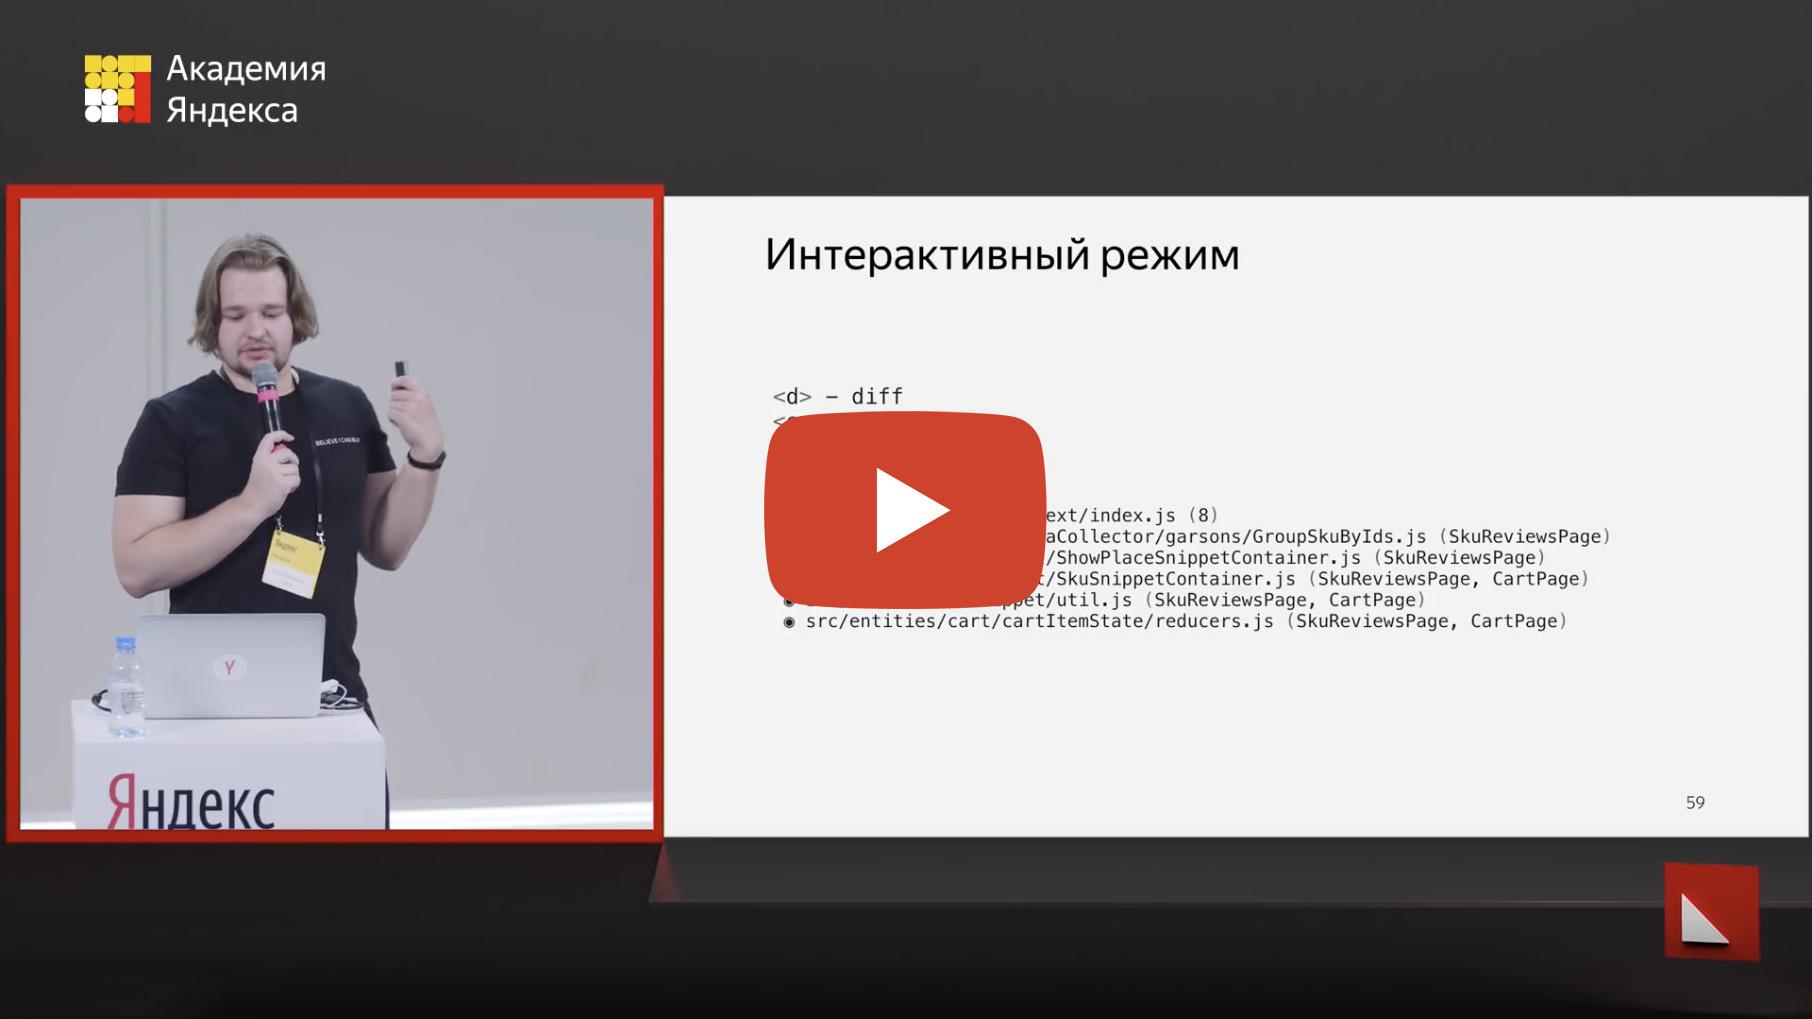 Жизнь до рантайма. Доклад Яндекса